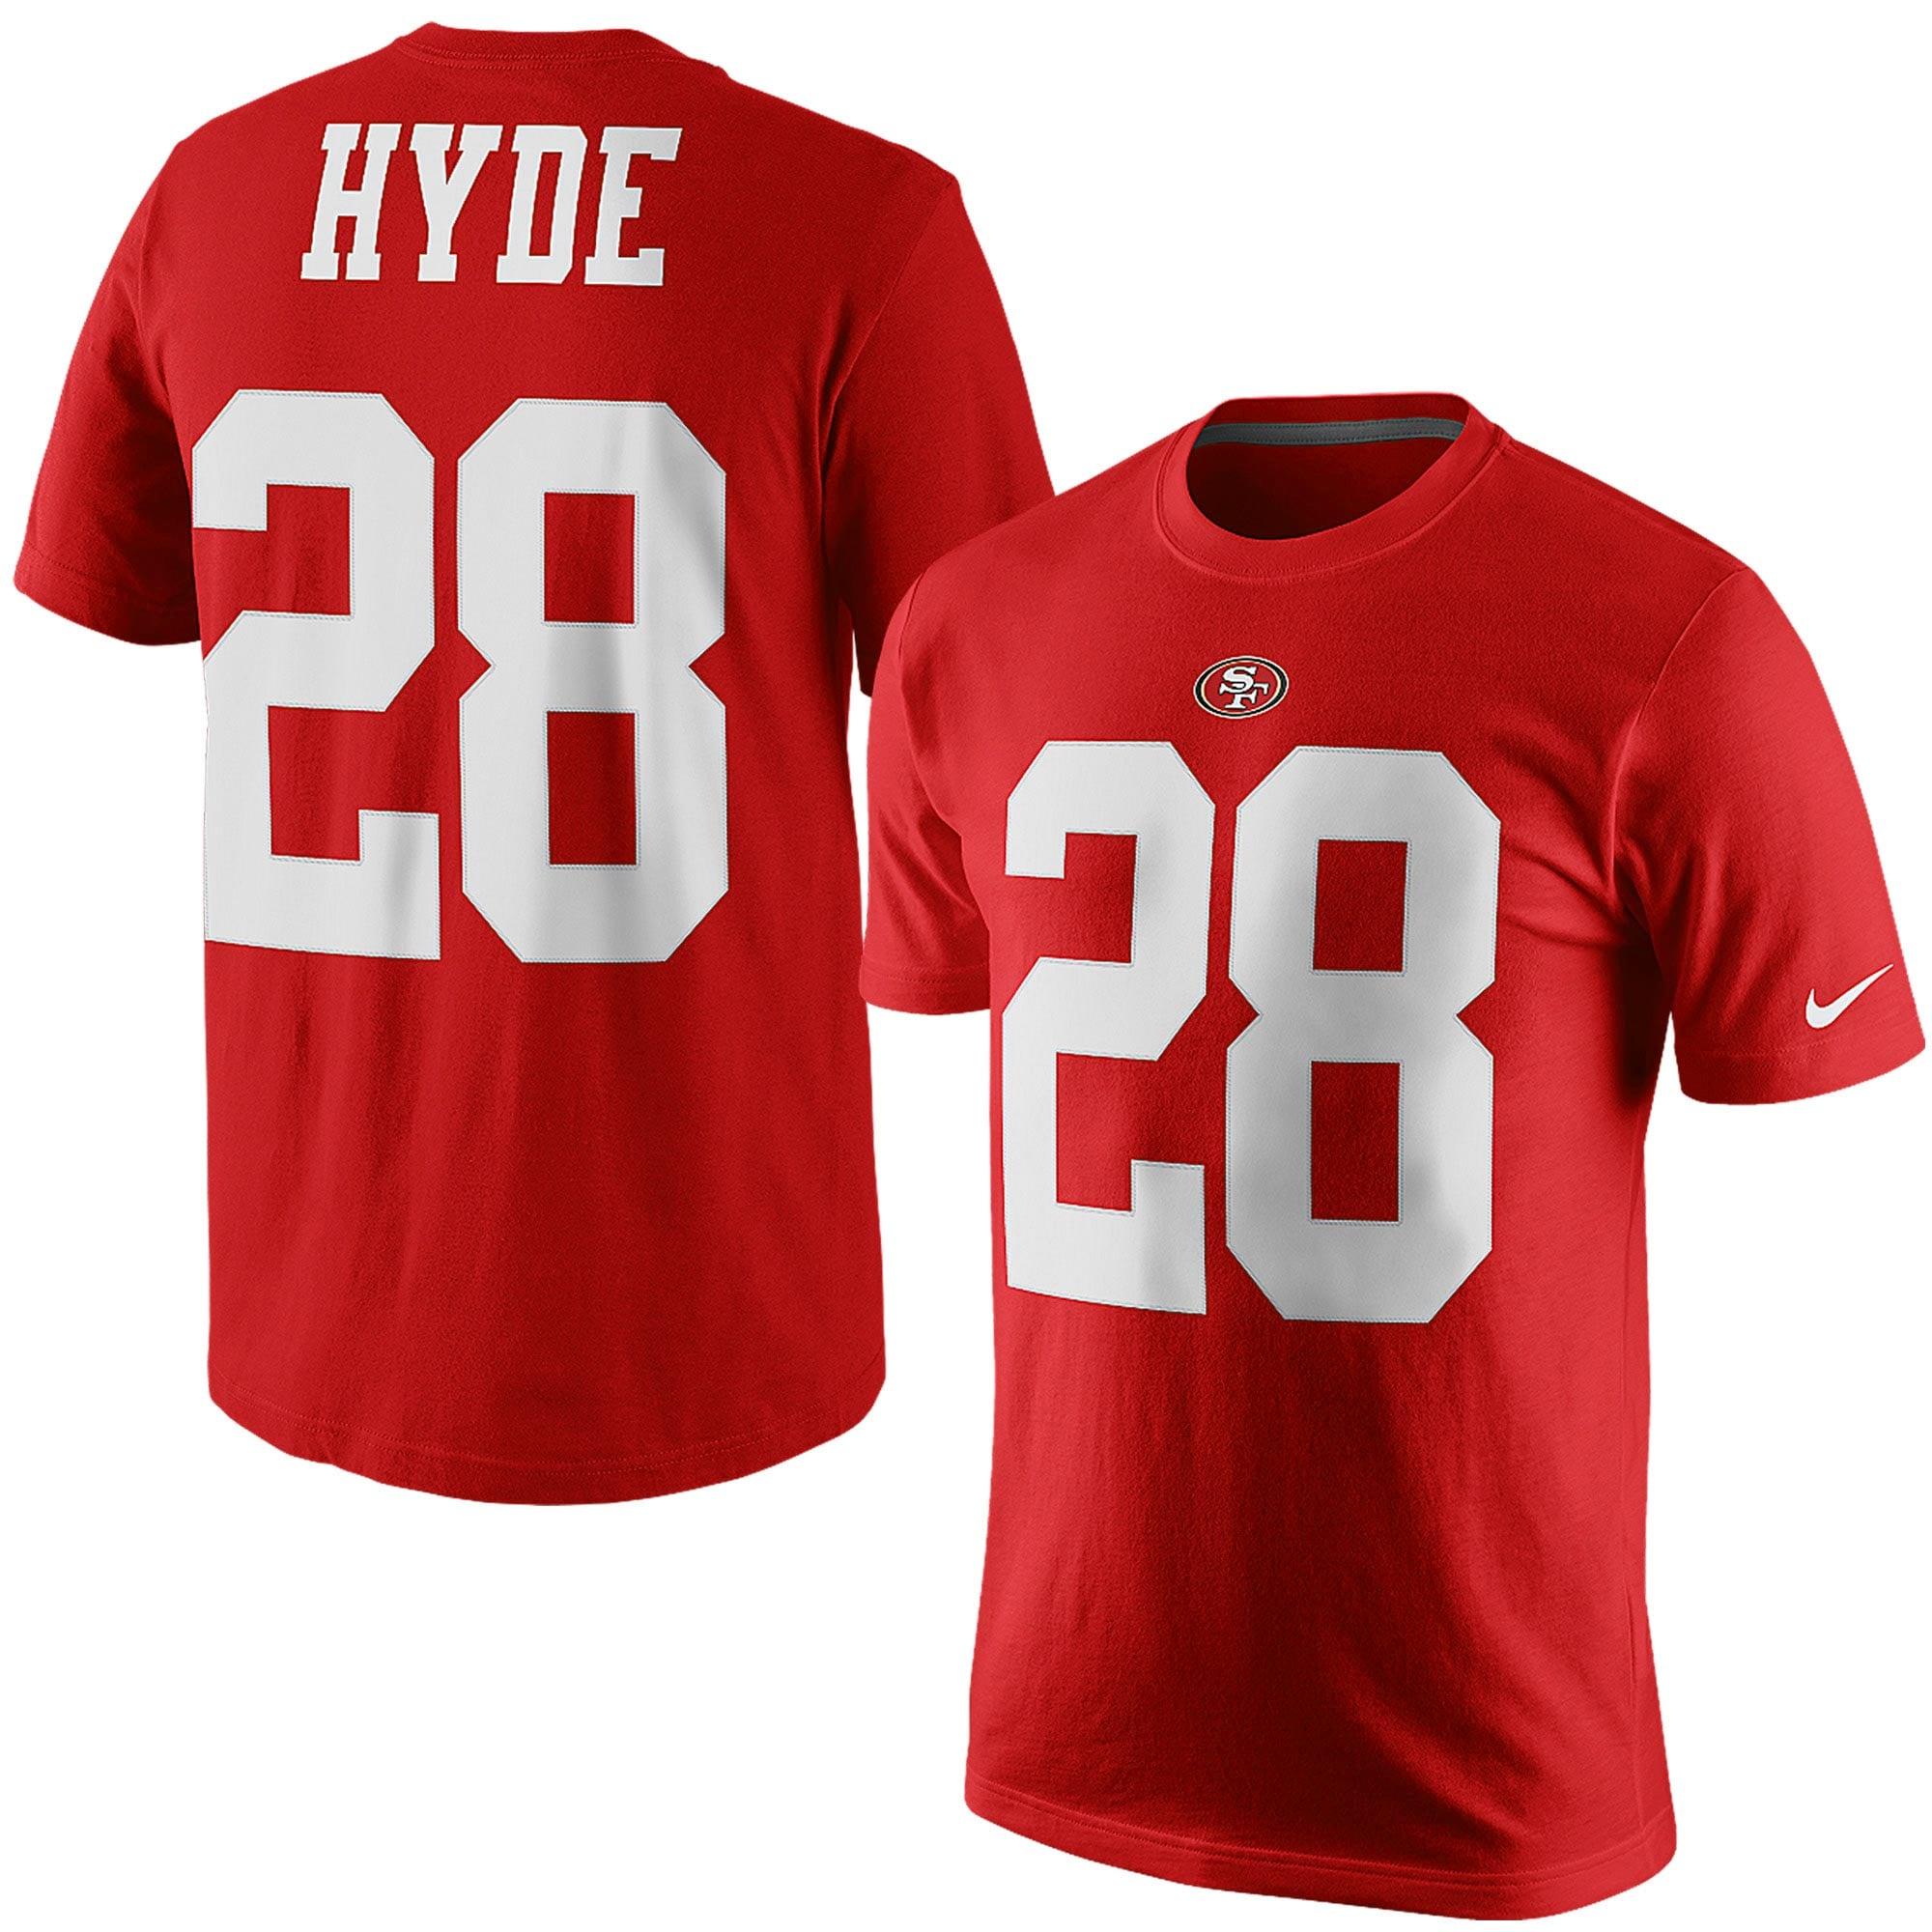 Carlos Hyde San Francisco 49ers Nike Player Pride Name & Number T-Shirt - Scarlet